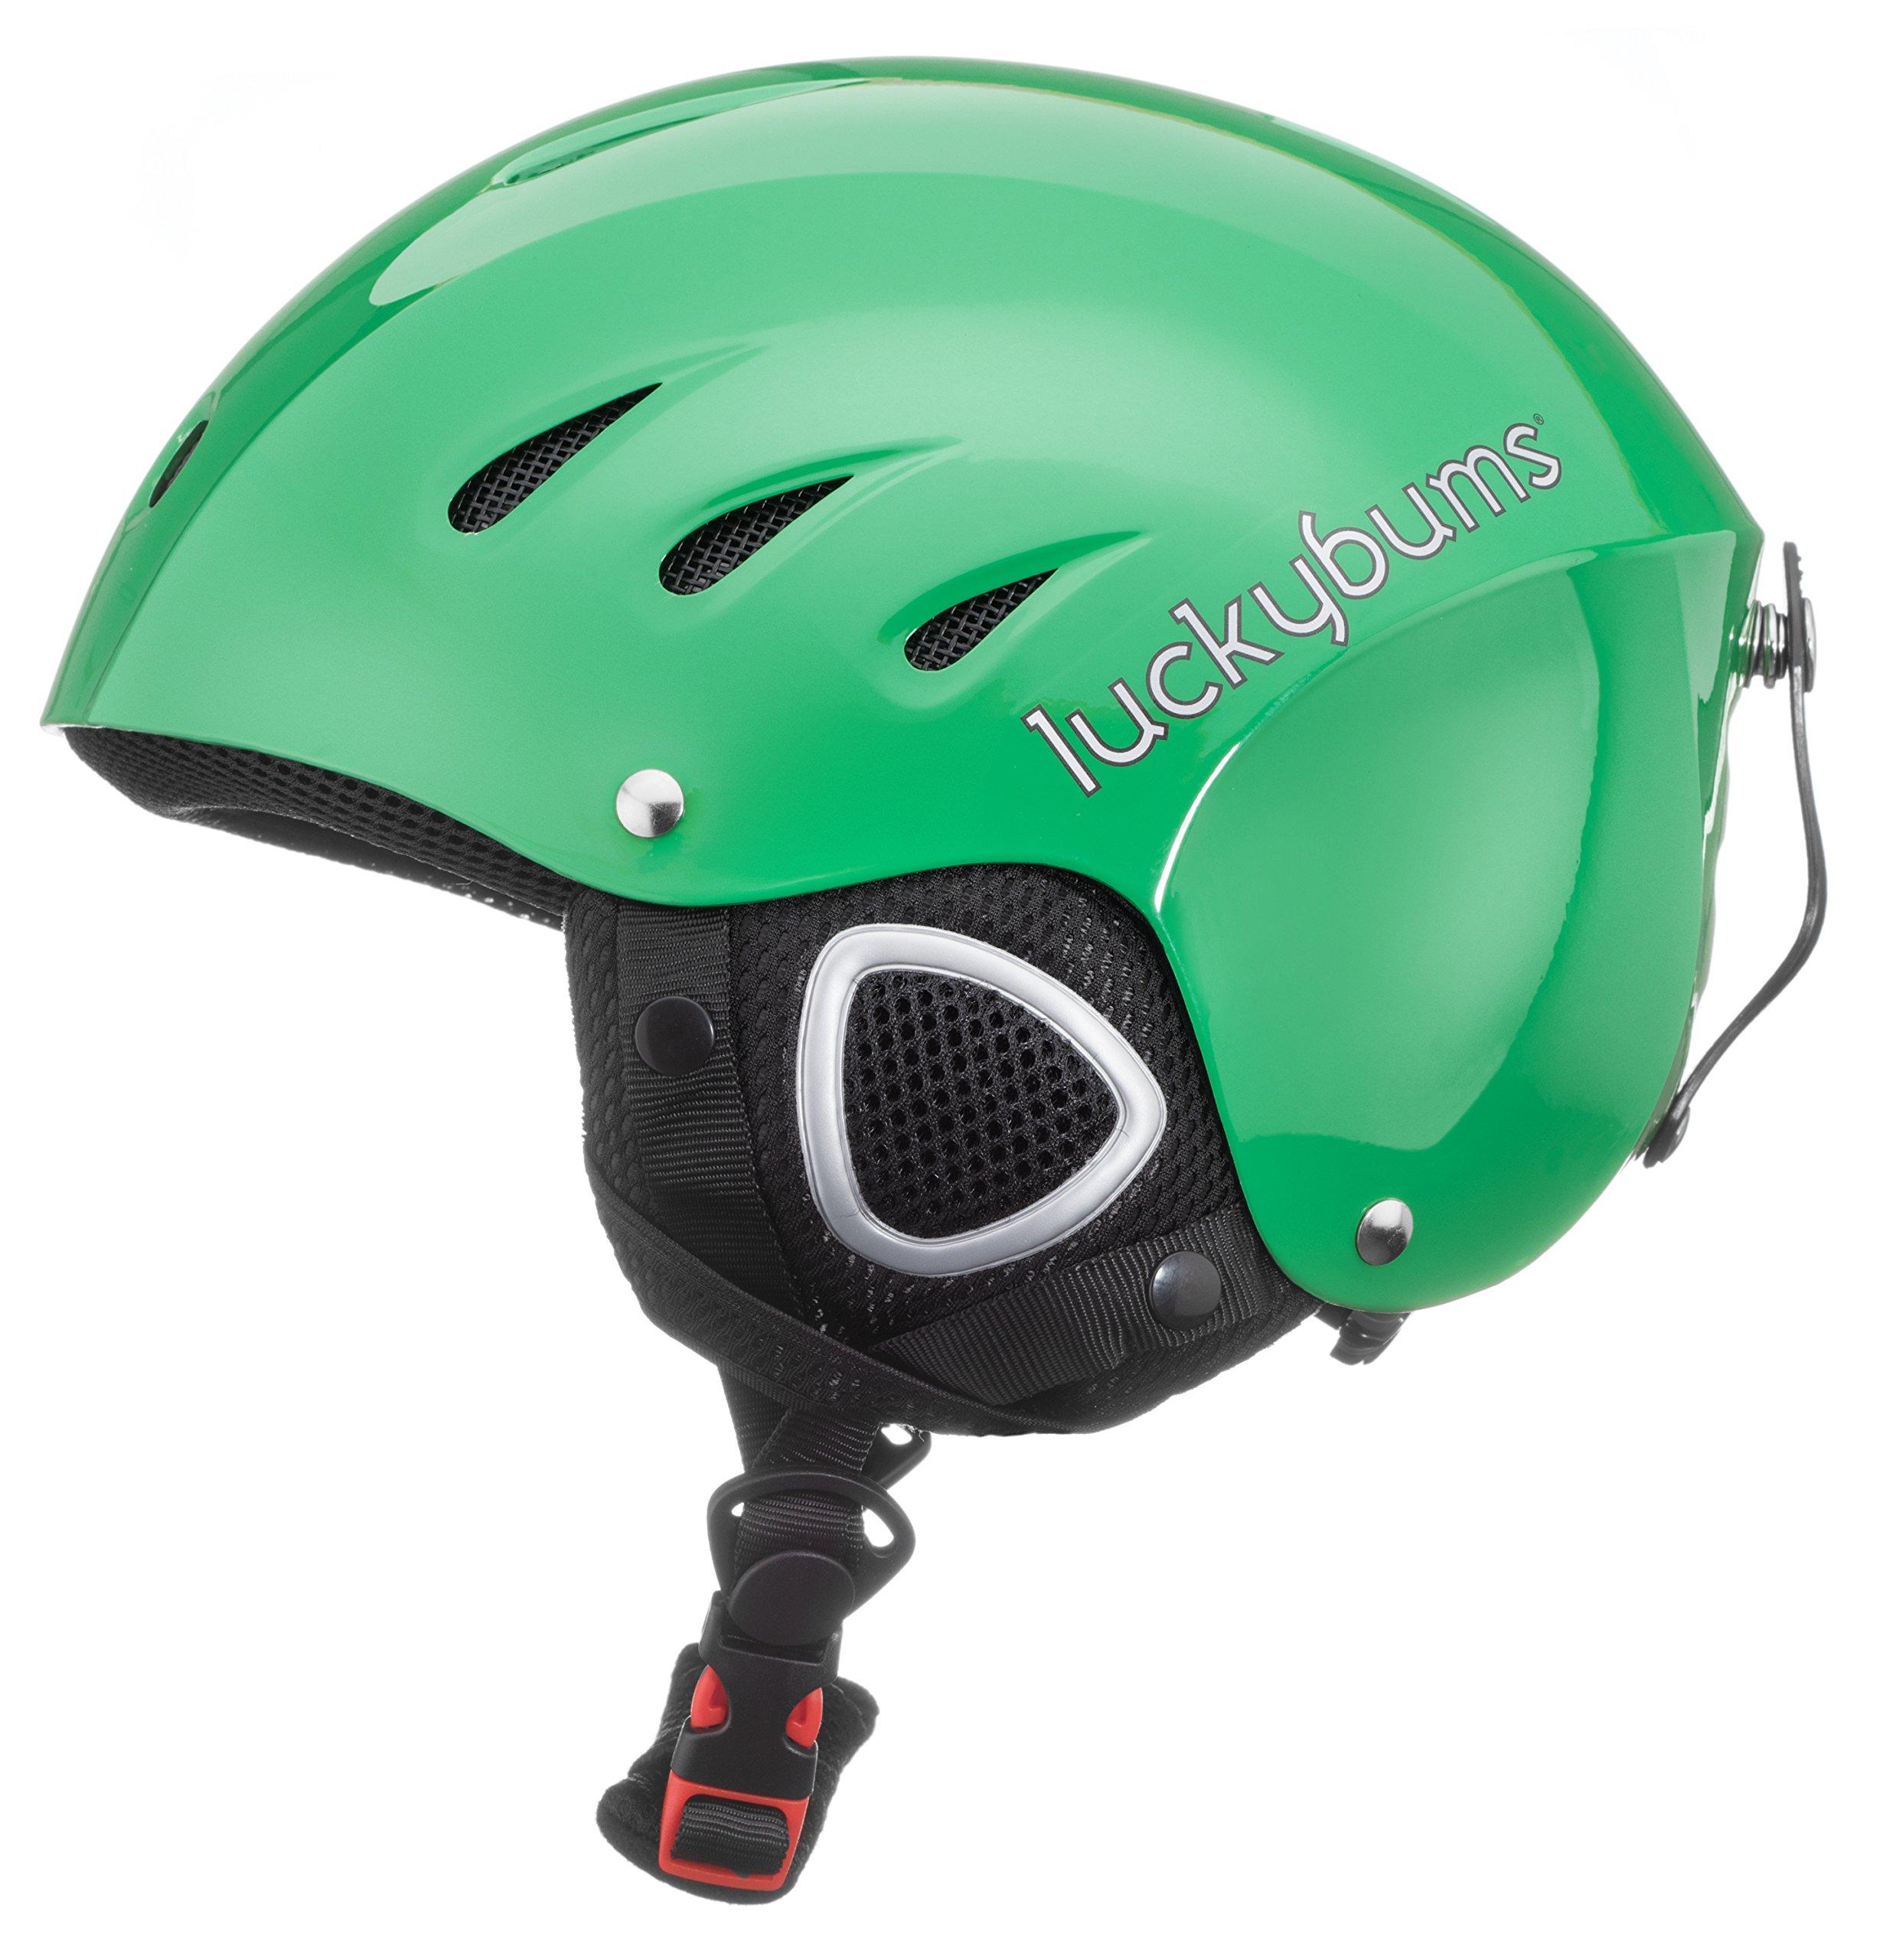 Lucky Bum Adult Snow Ski Helmet